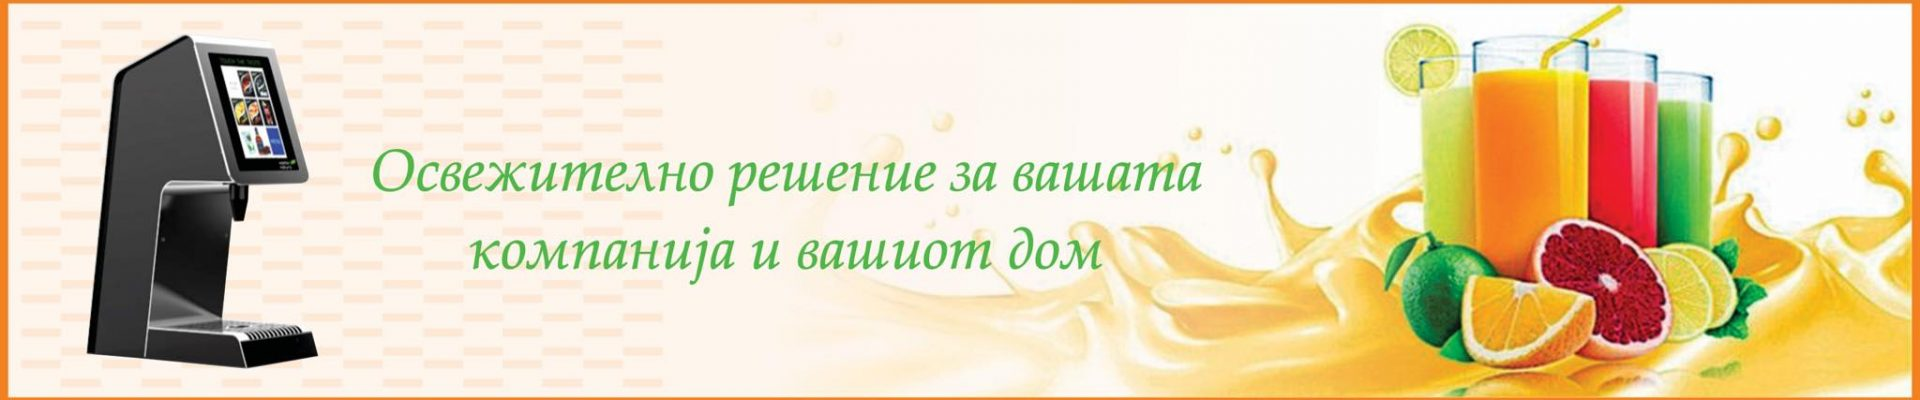 123717481_3443282352457830_2450971982983799467_n